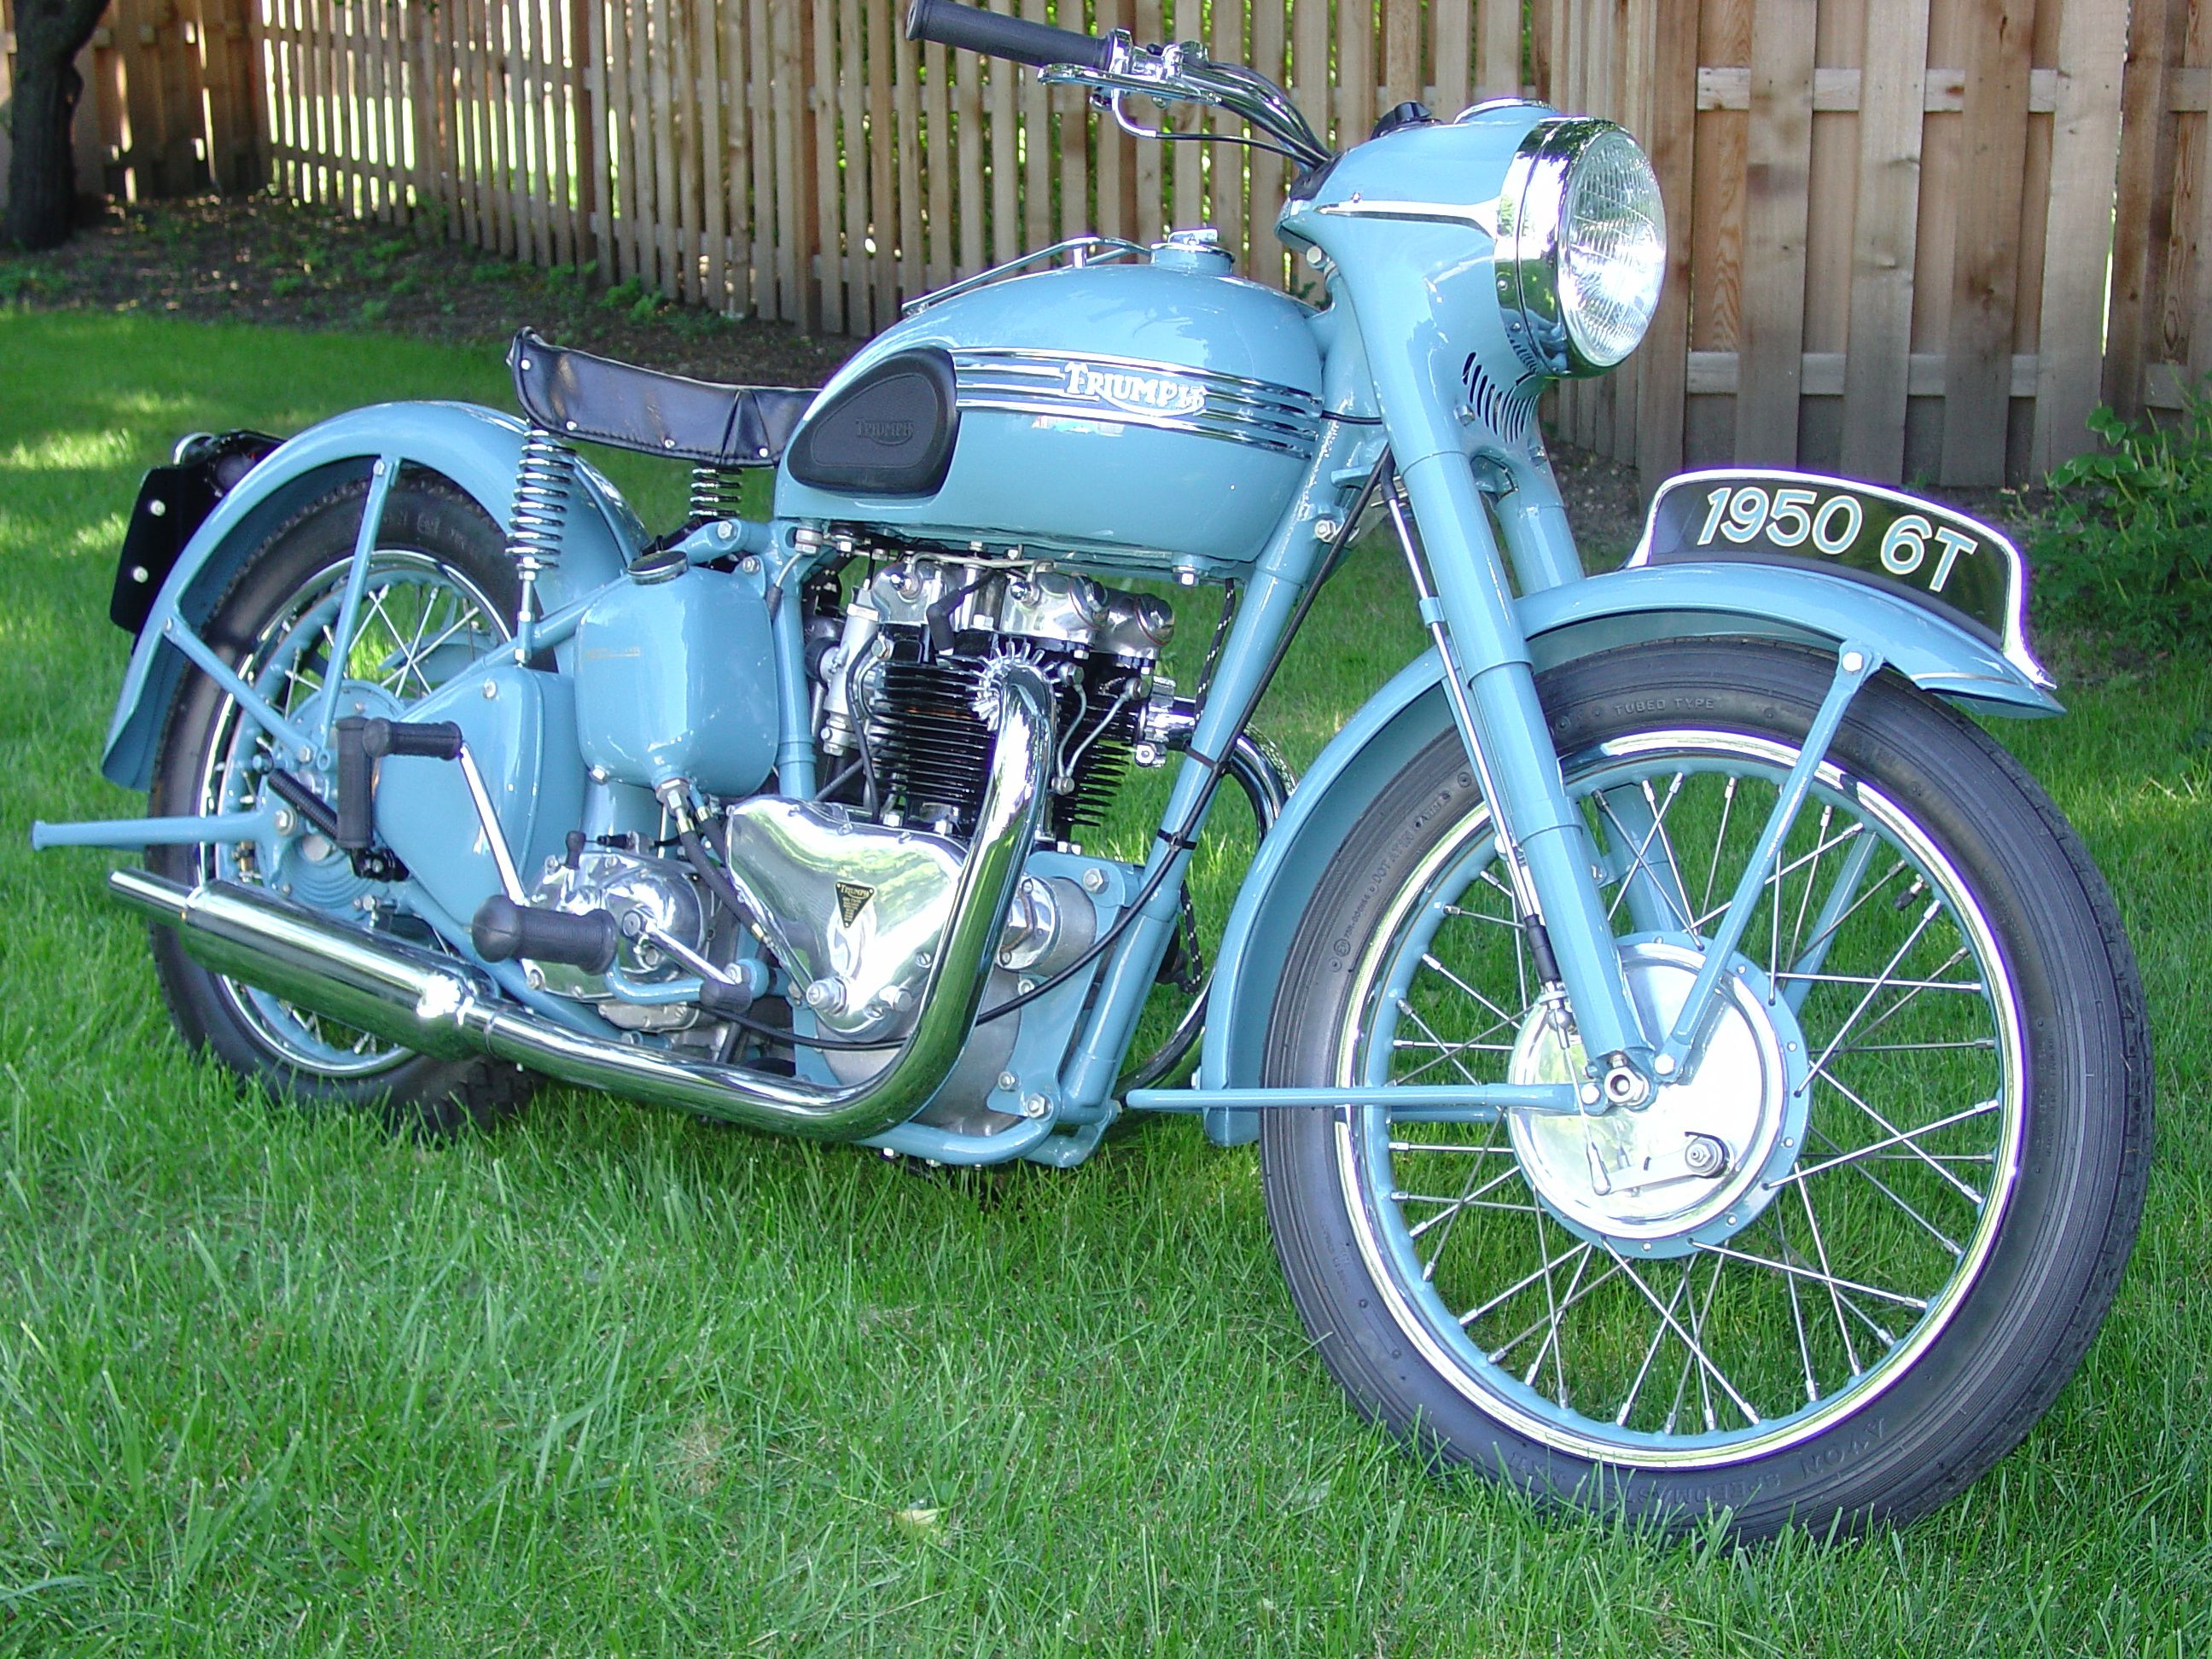 1950 Triumph Thunderbird Triumph Bikes Classic Motorcycles British Motorcycles